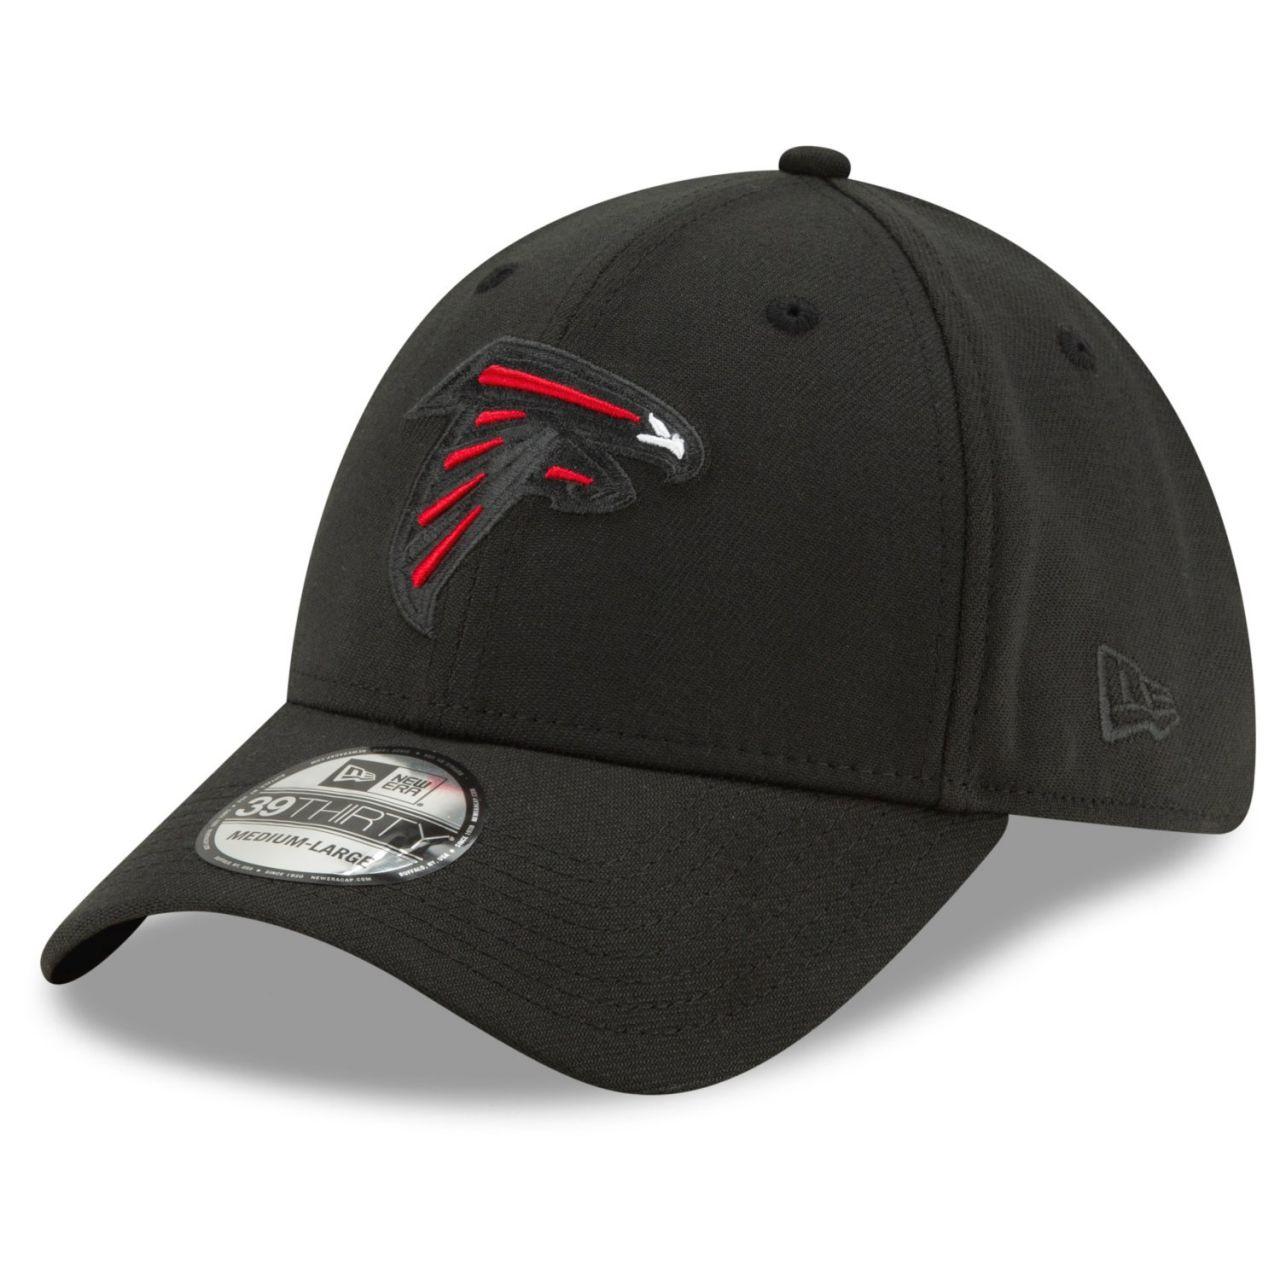 amfoo - New Era 39Thirty Stretch Cap - ELEMENTS Atlanta Falcons